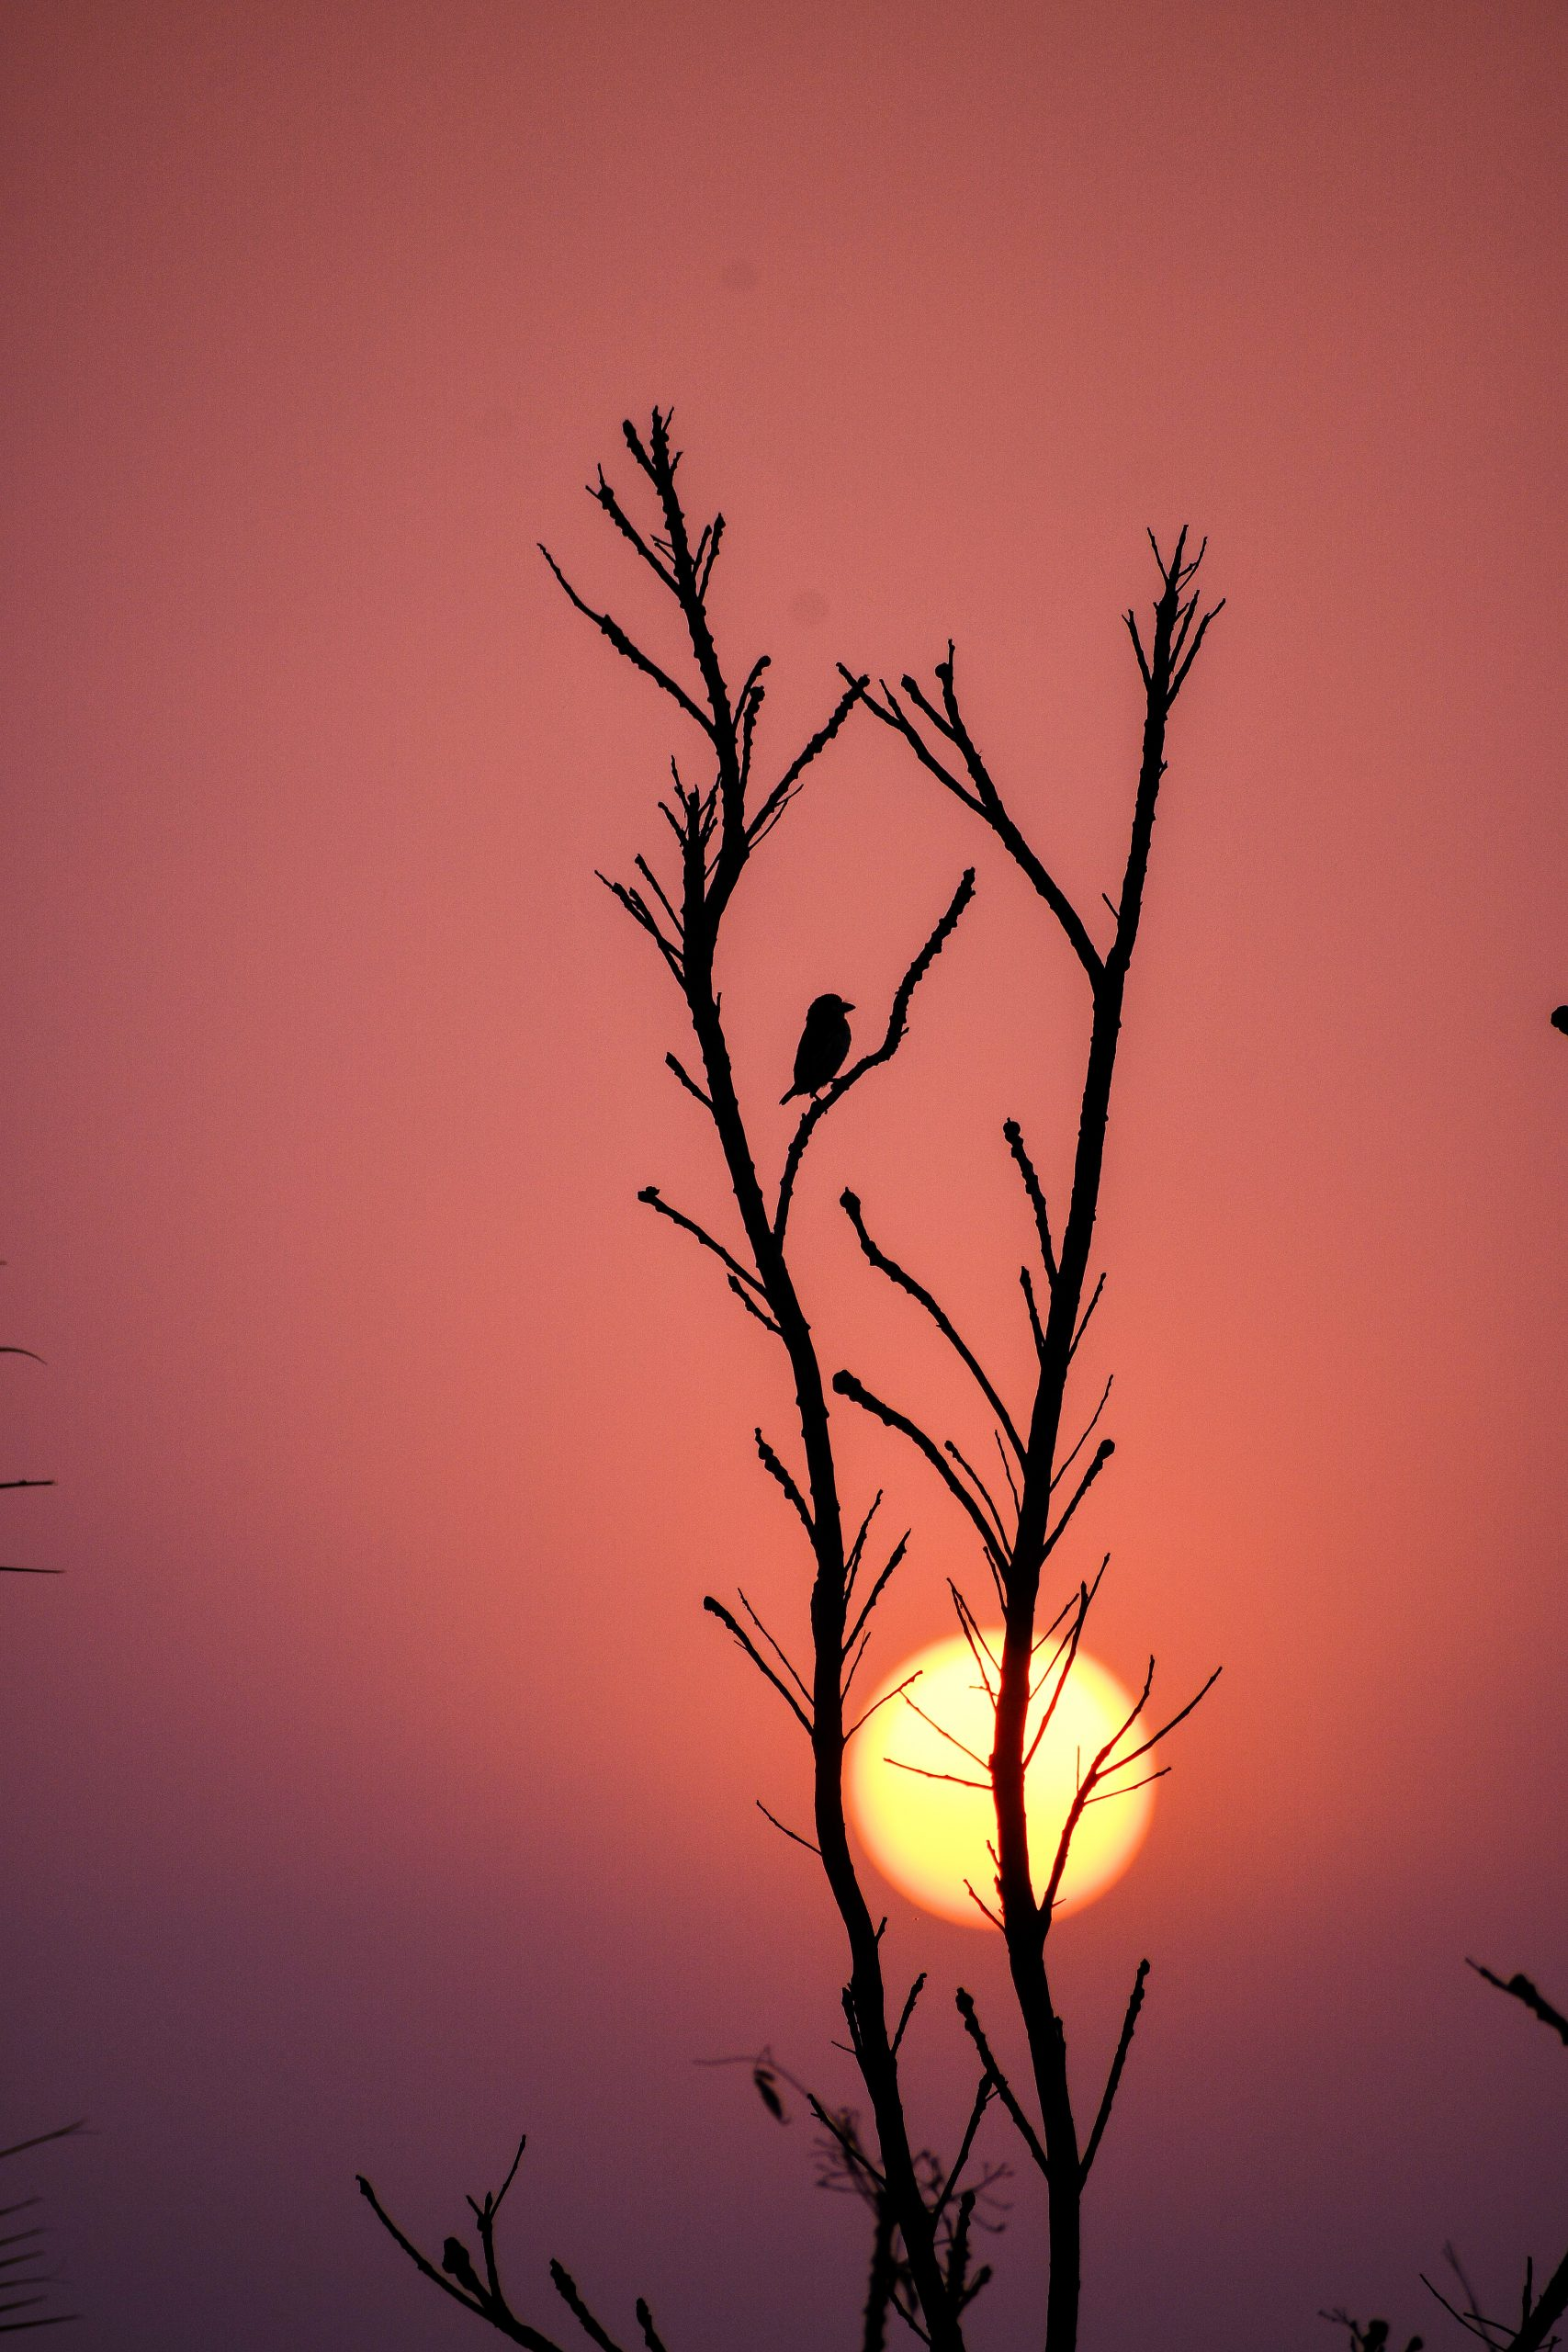 Sunset through a plant